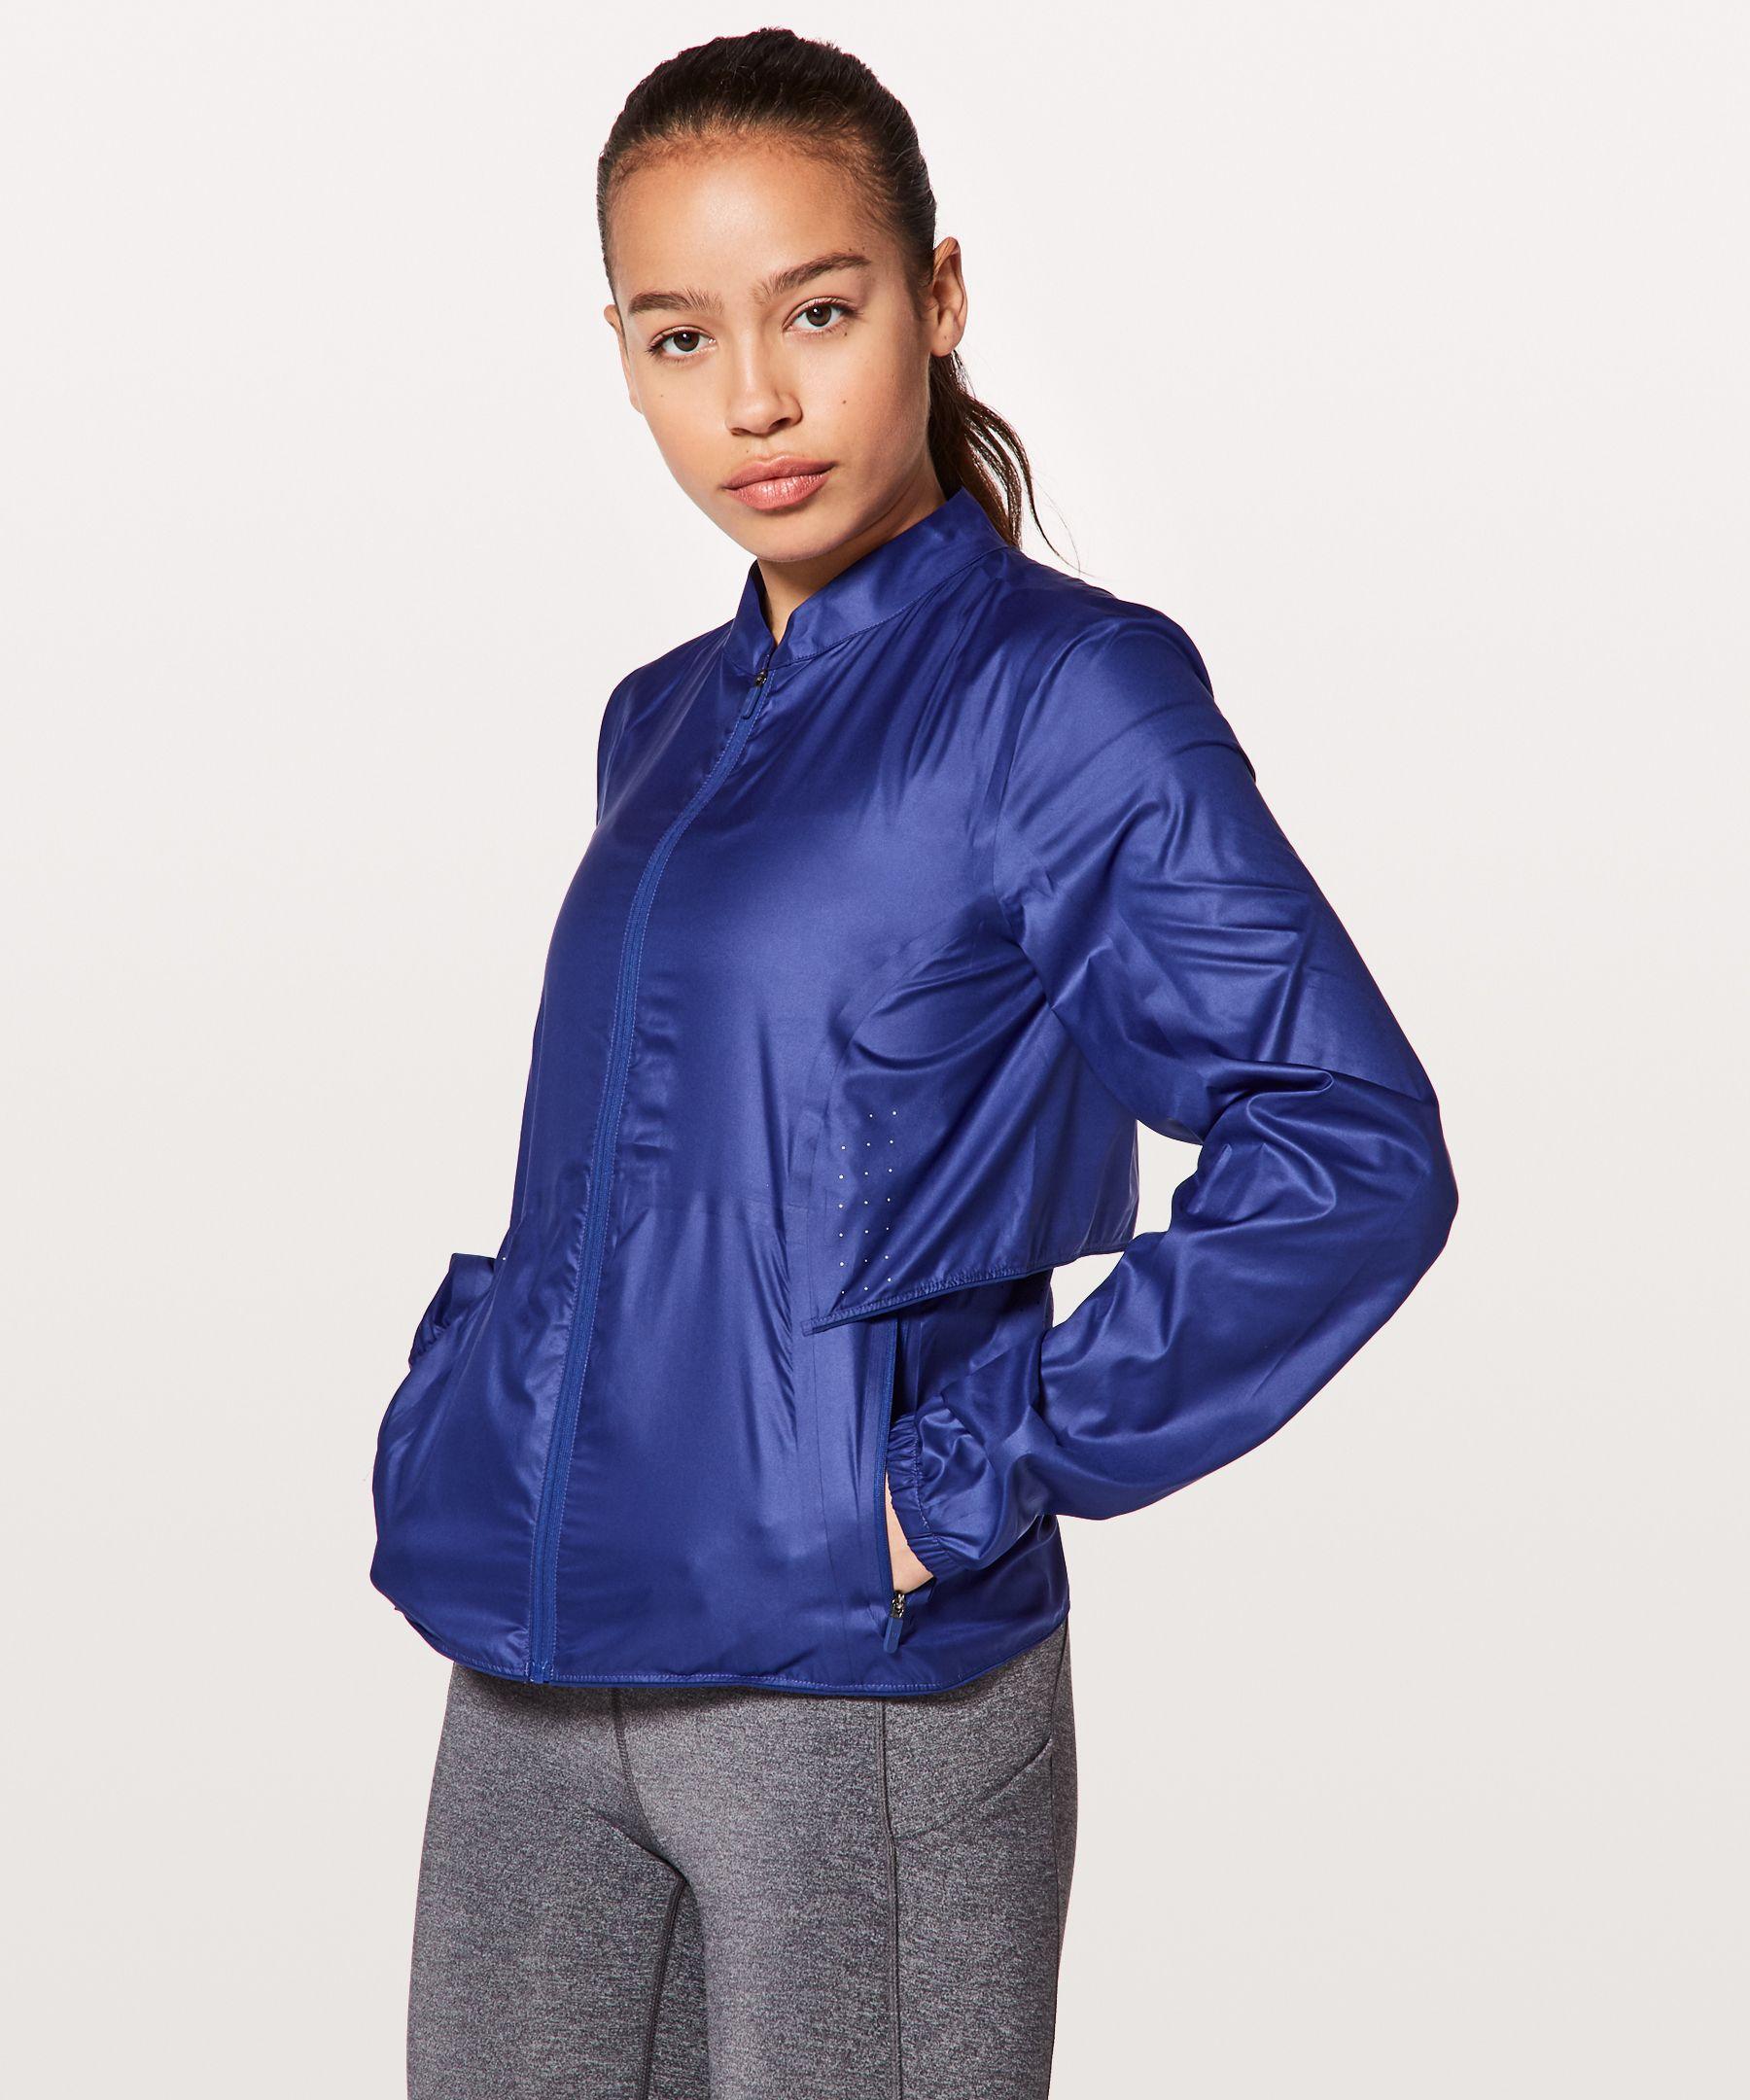 552f17420fe6 Deep Inhale Jacket by Lululemon